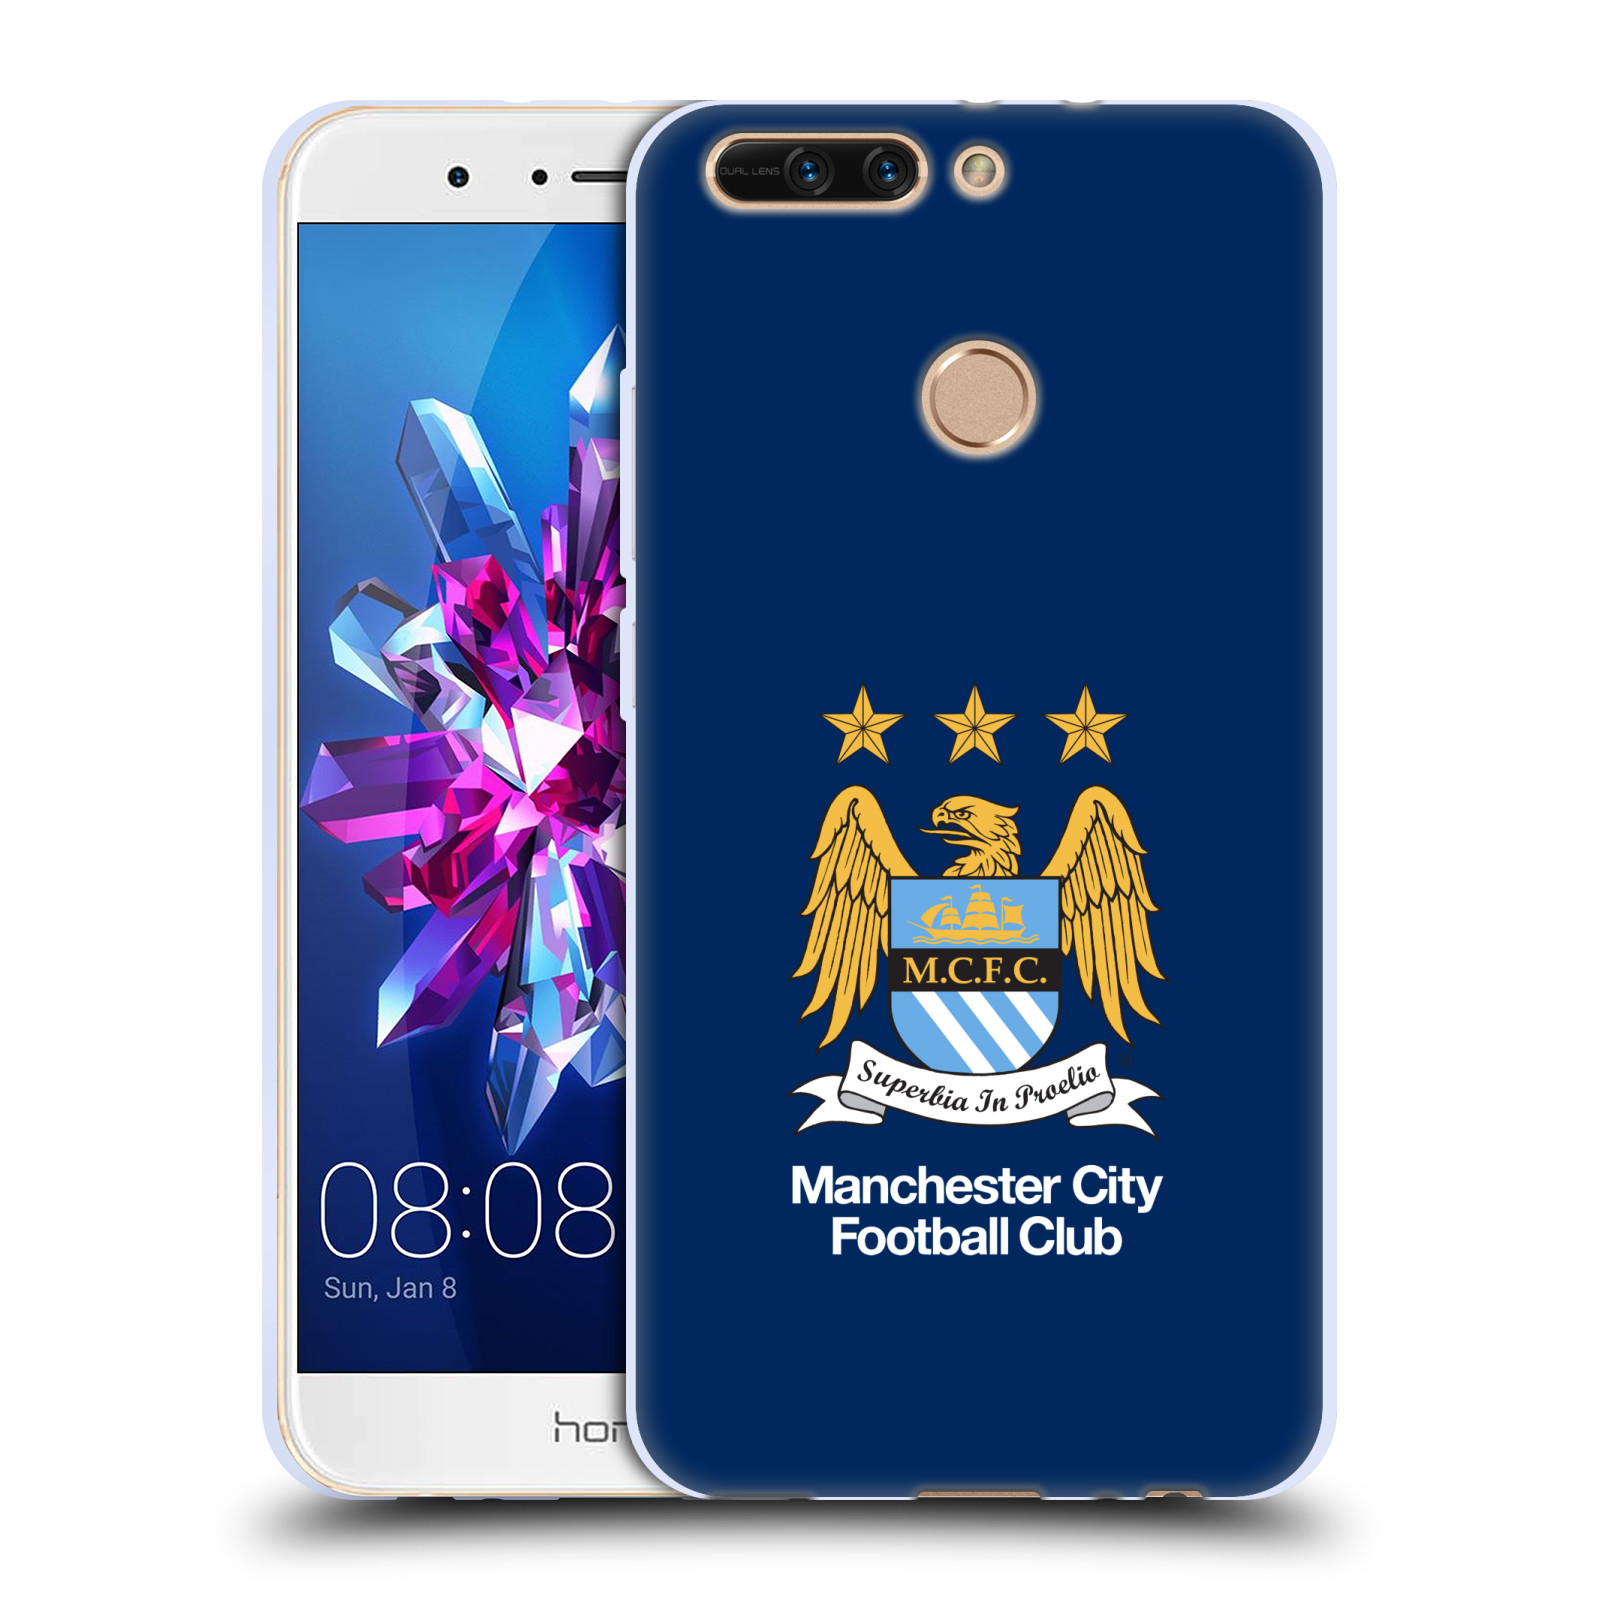 HEAD CASE silikonový obal na mobil Huawei HONOR 8 PRO / Honor 8 PRO DUAL SIM Fotbalový klub Manchester City modré pozadí velký znak